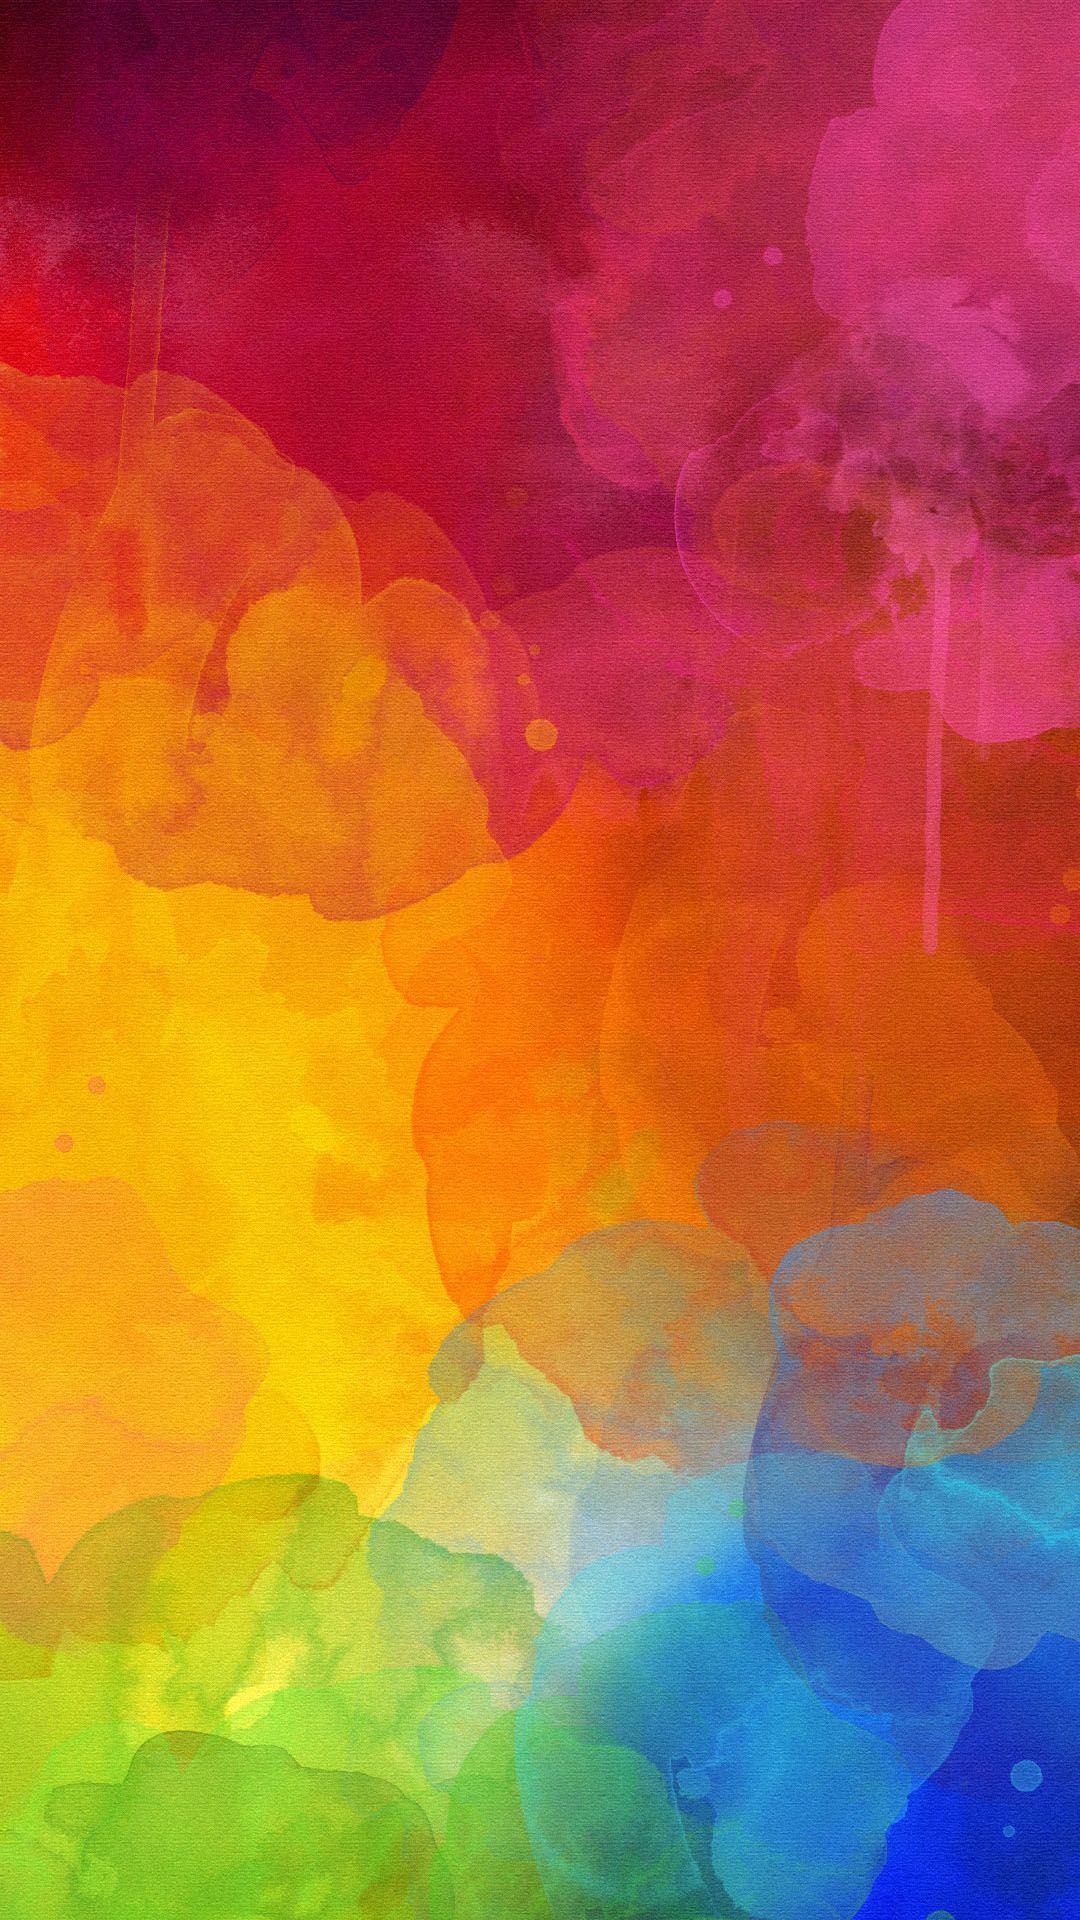 Iphone Wallpaper Swag 138 Color Wallpaper Iphone Rainbow Wallpaper Colorful Wallpaper